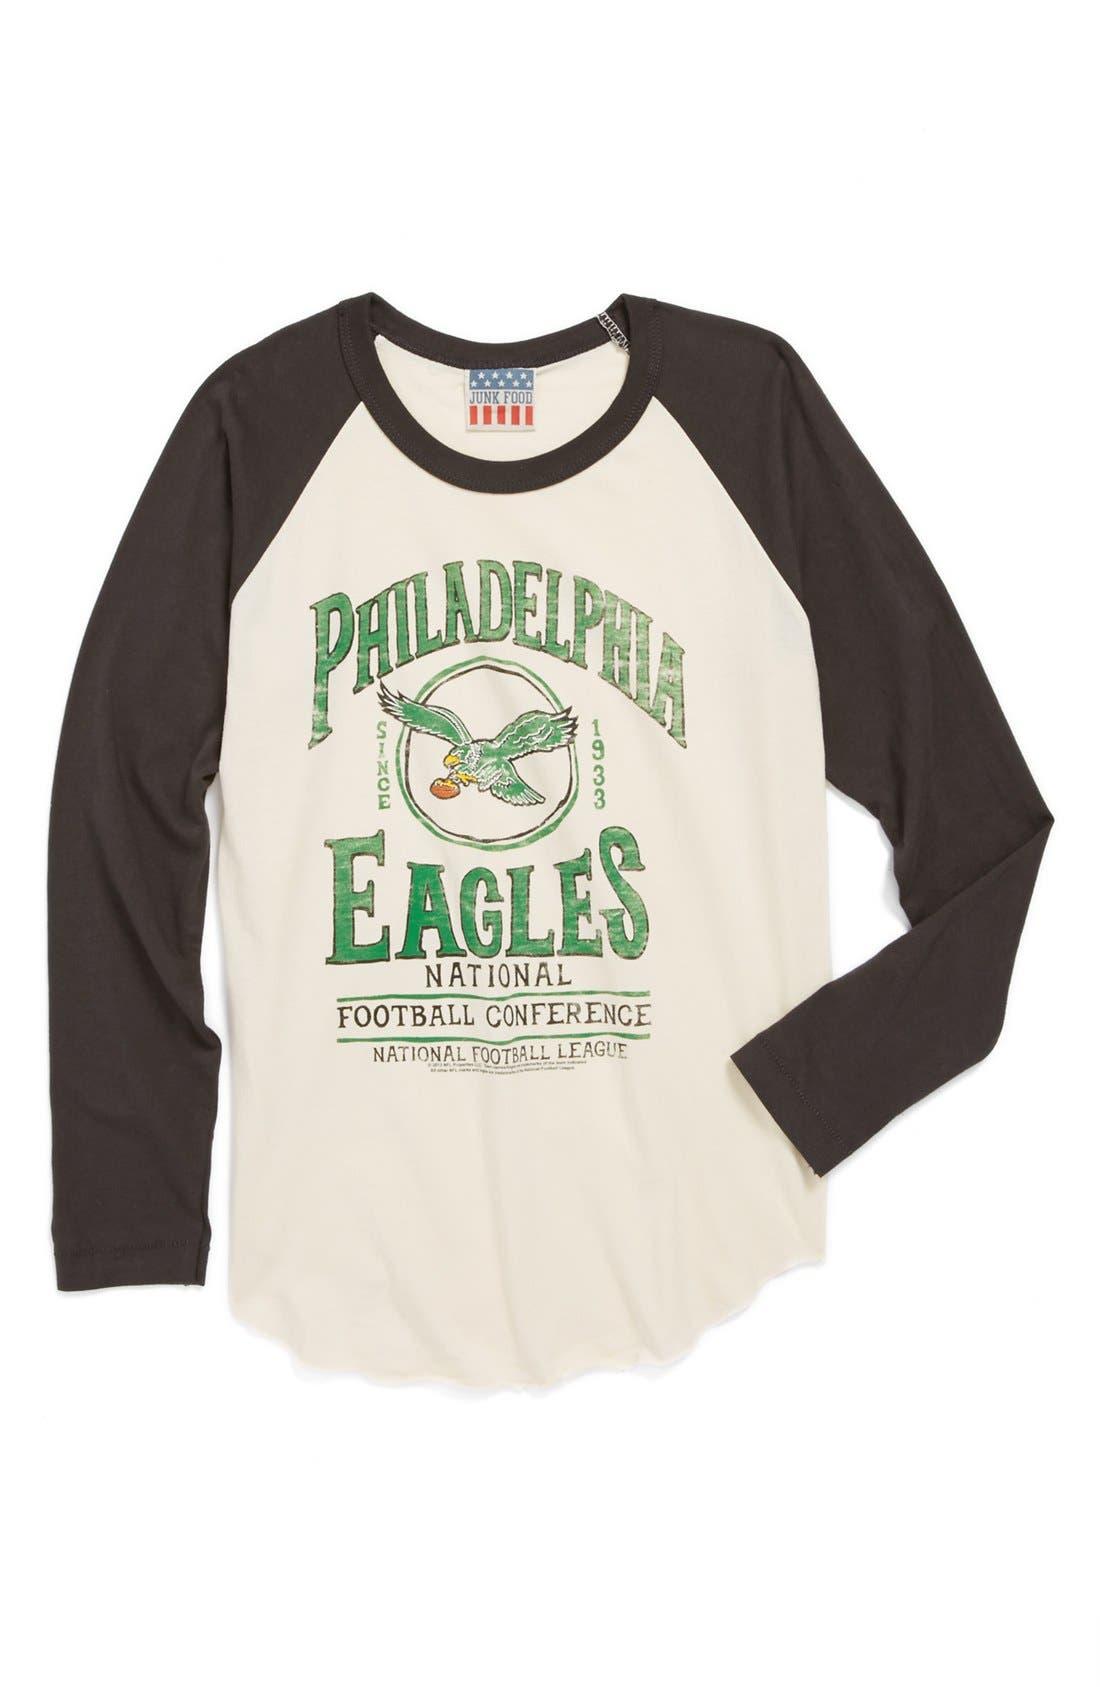 Alternate Image 1 Selected - Junk Food 'Philadelphia Eagles' Raglan Long Sleeve T-Shirt (Toddler Boys)